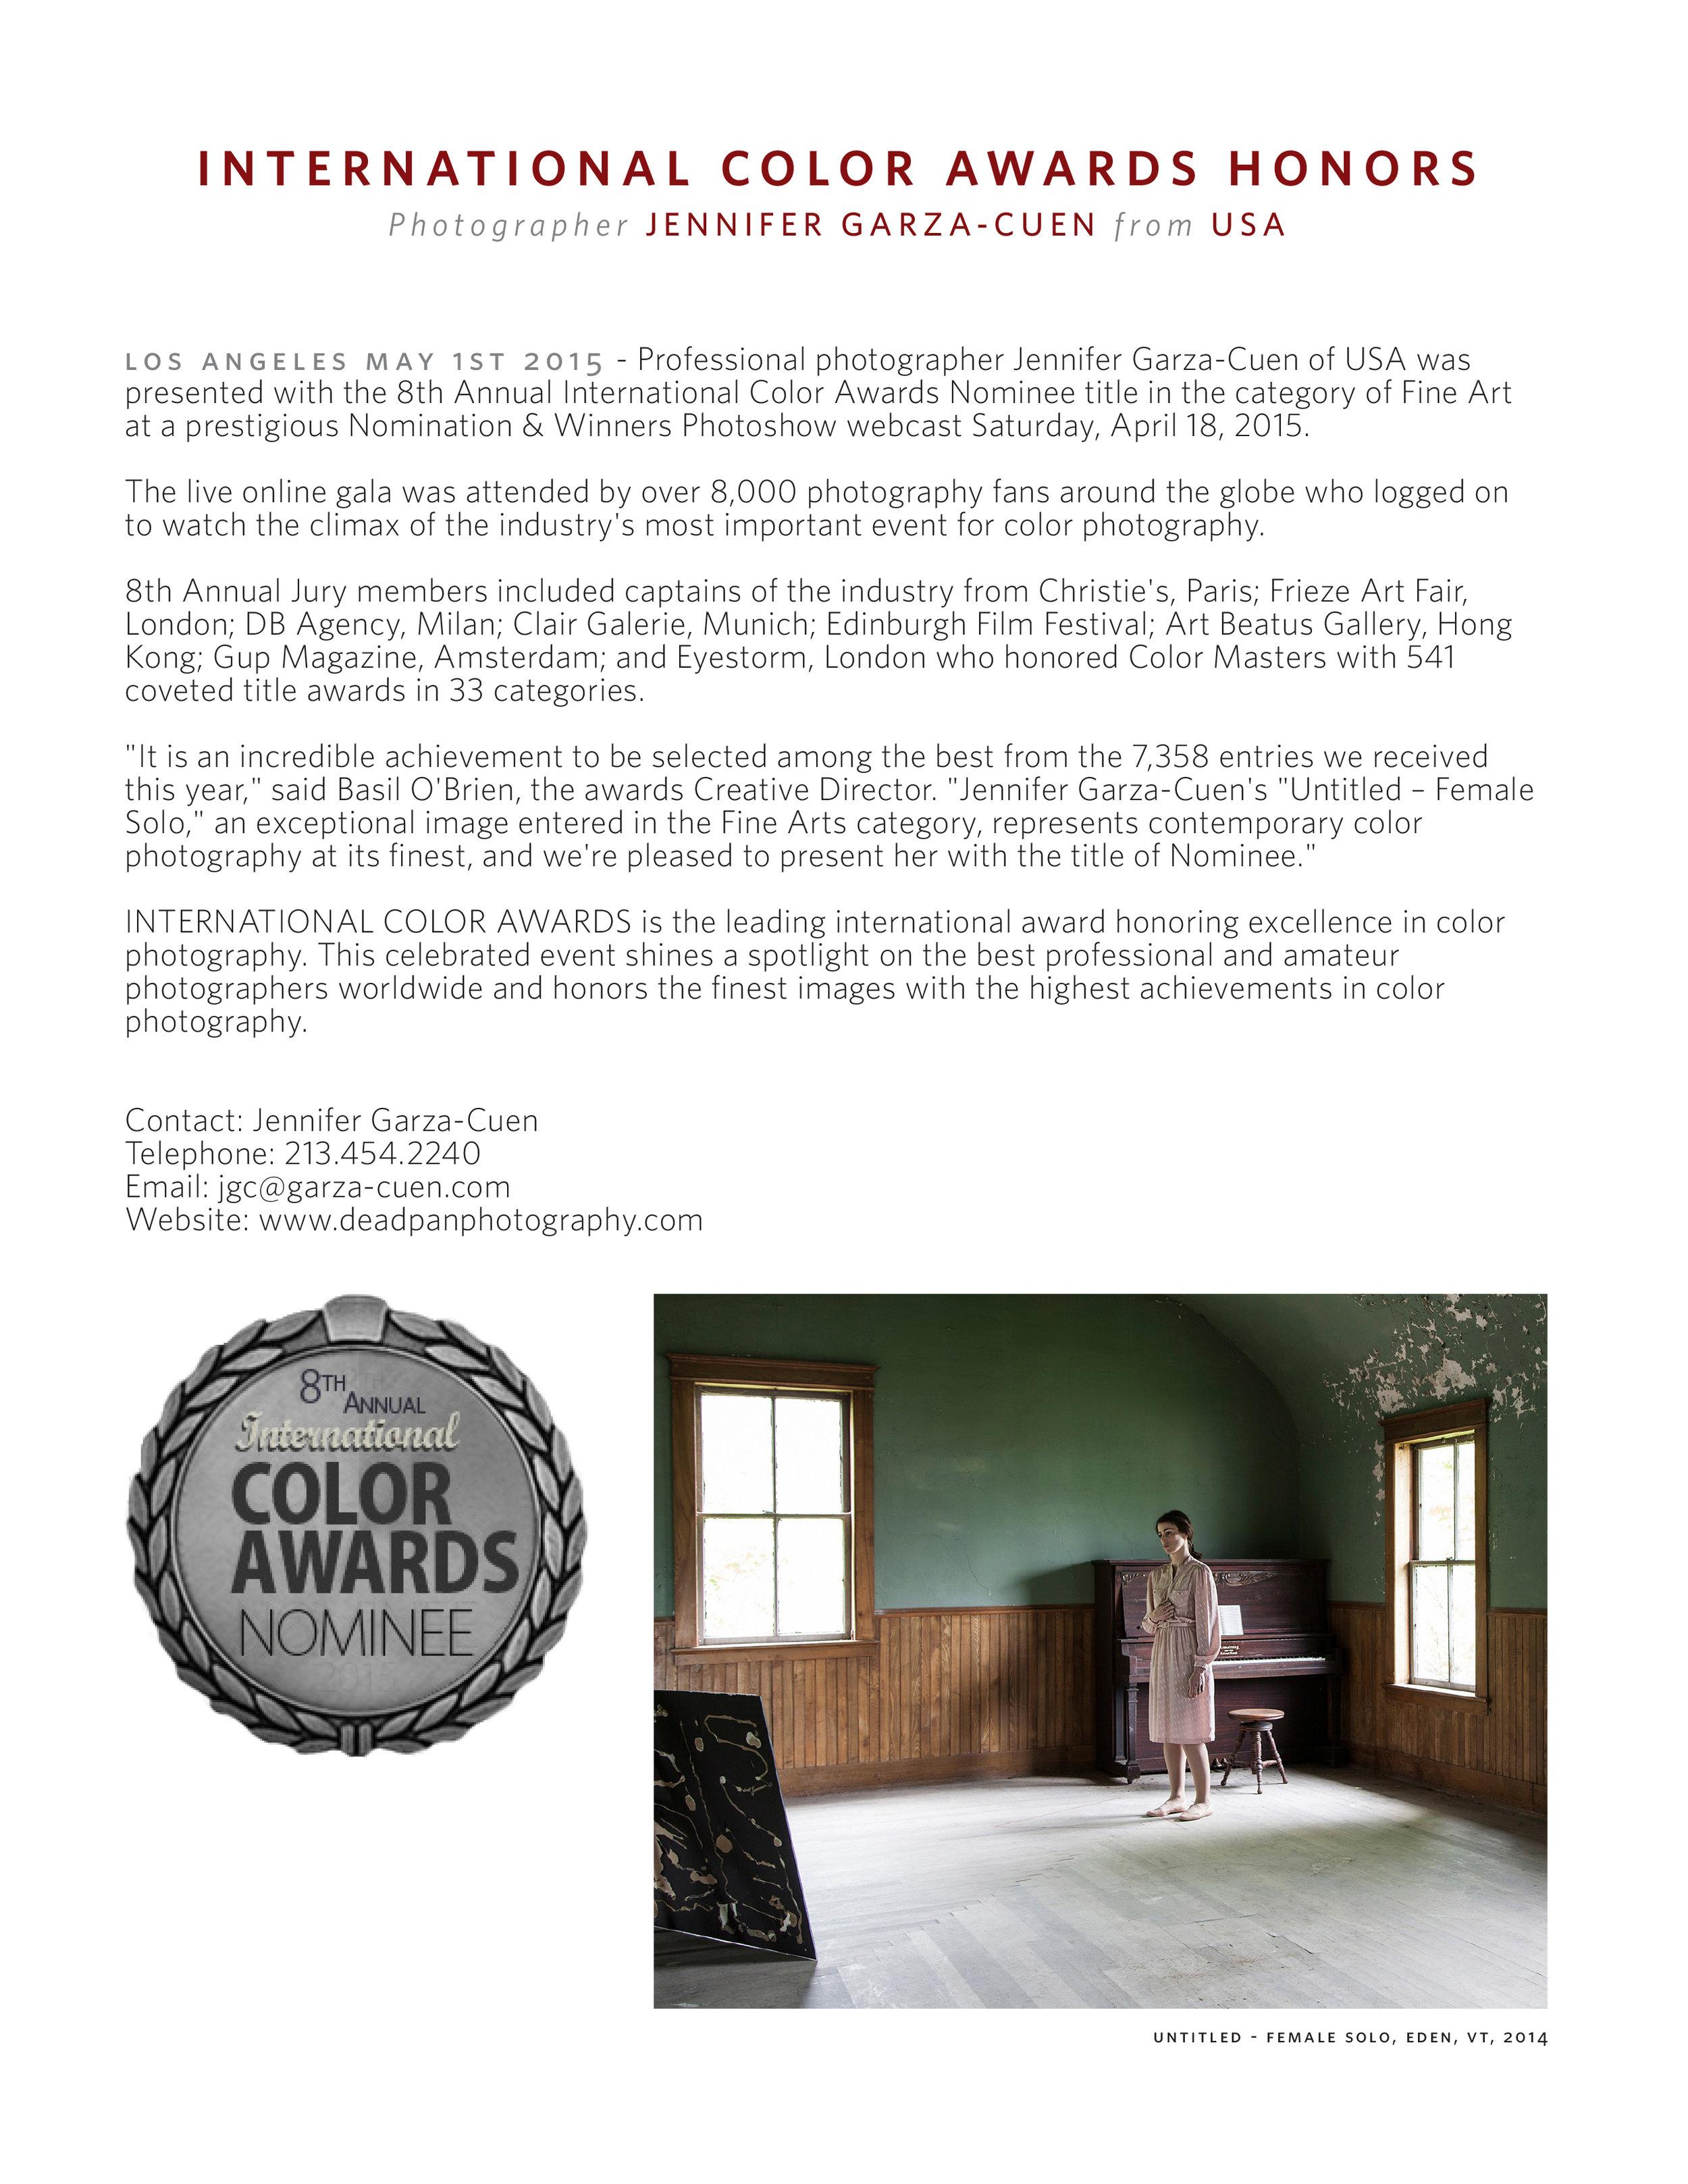 Color Awards Press Release 2015